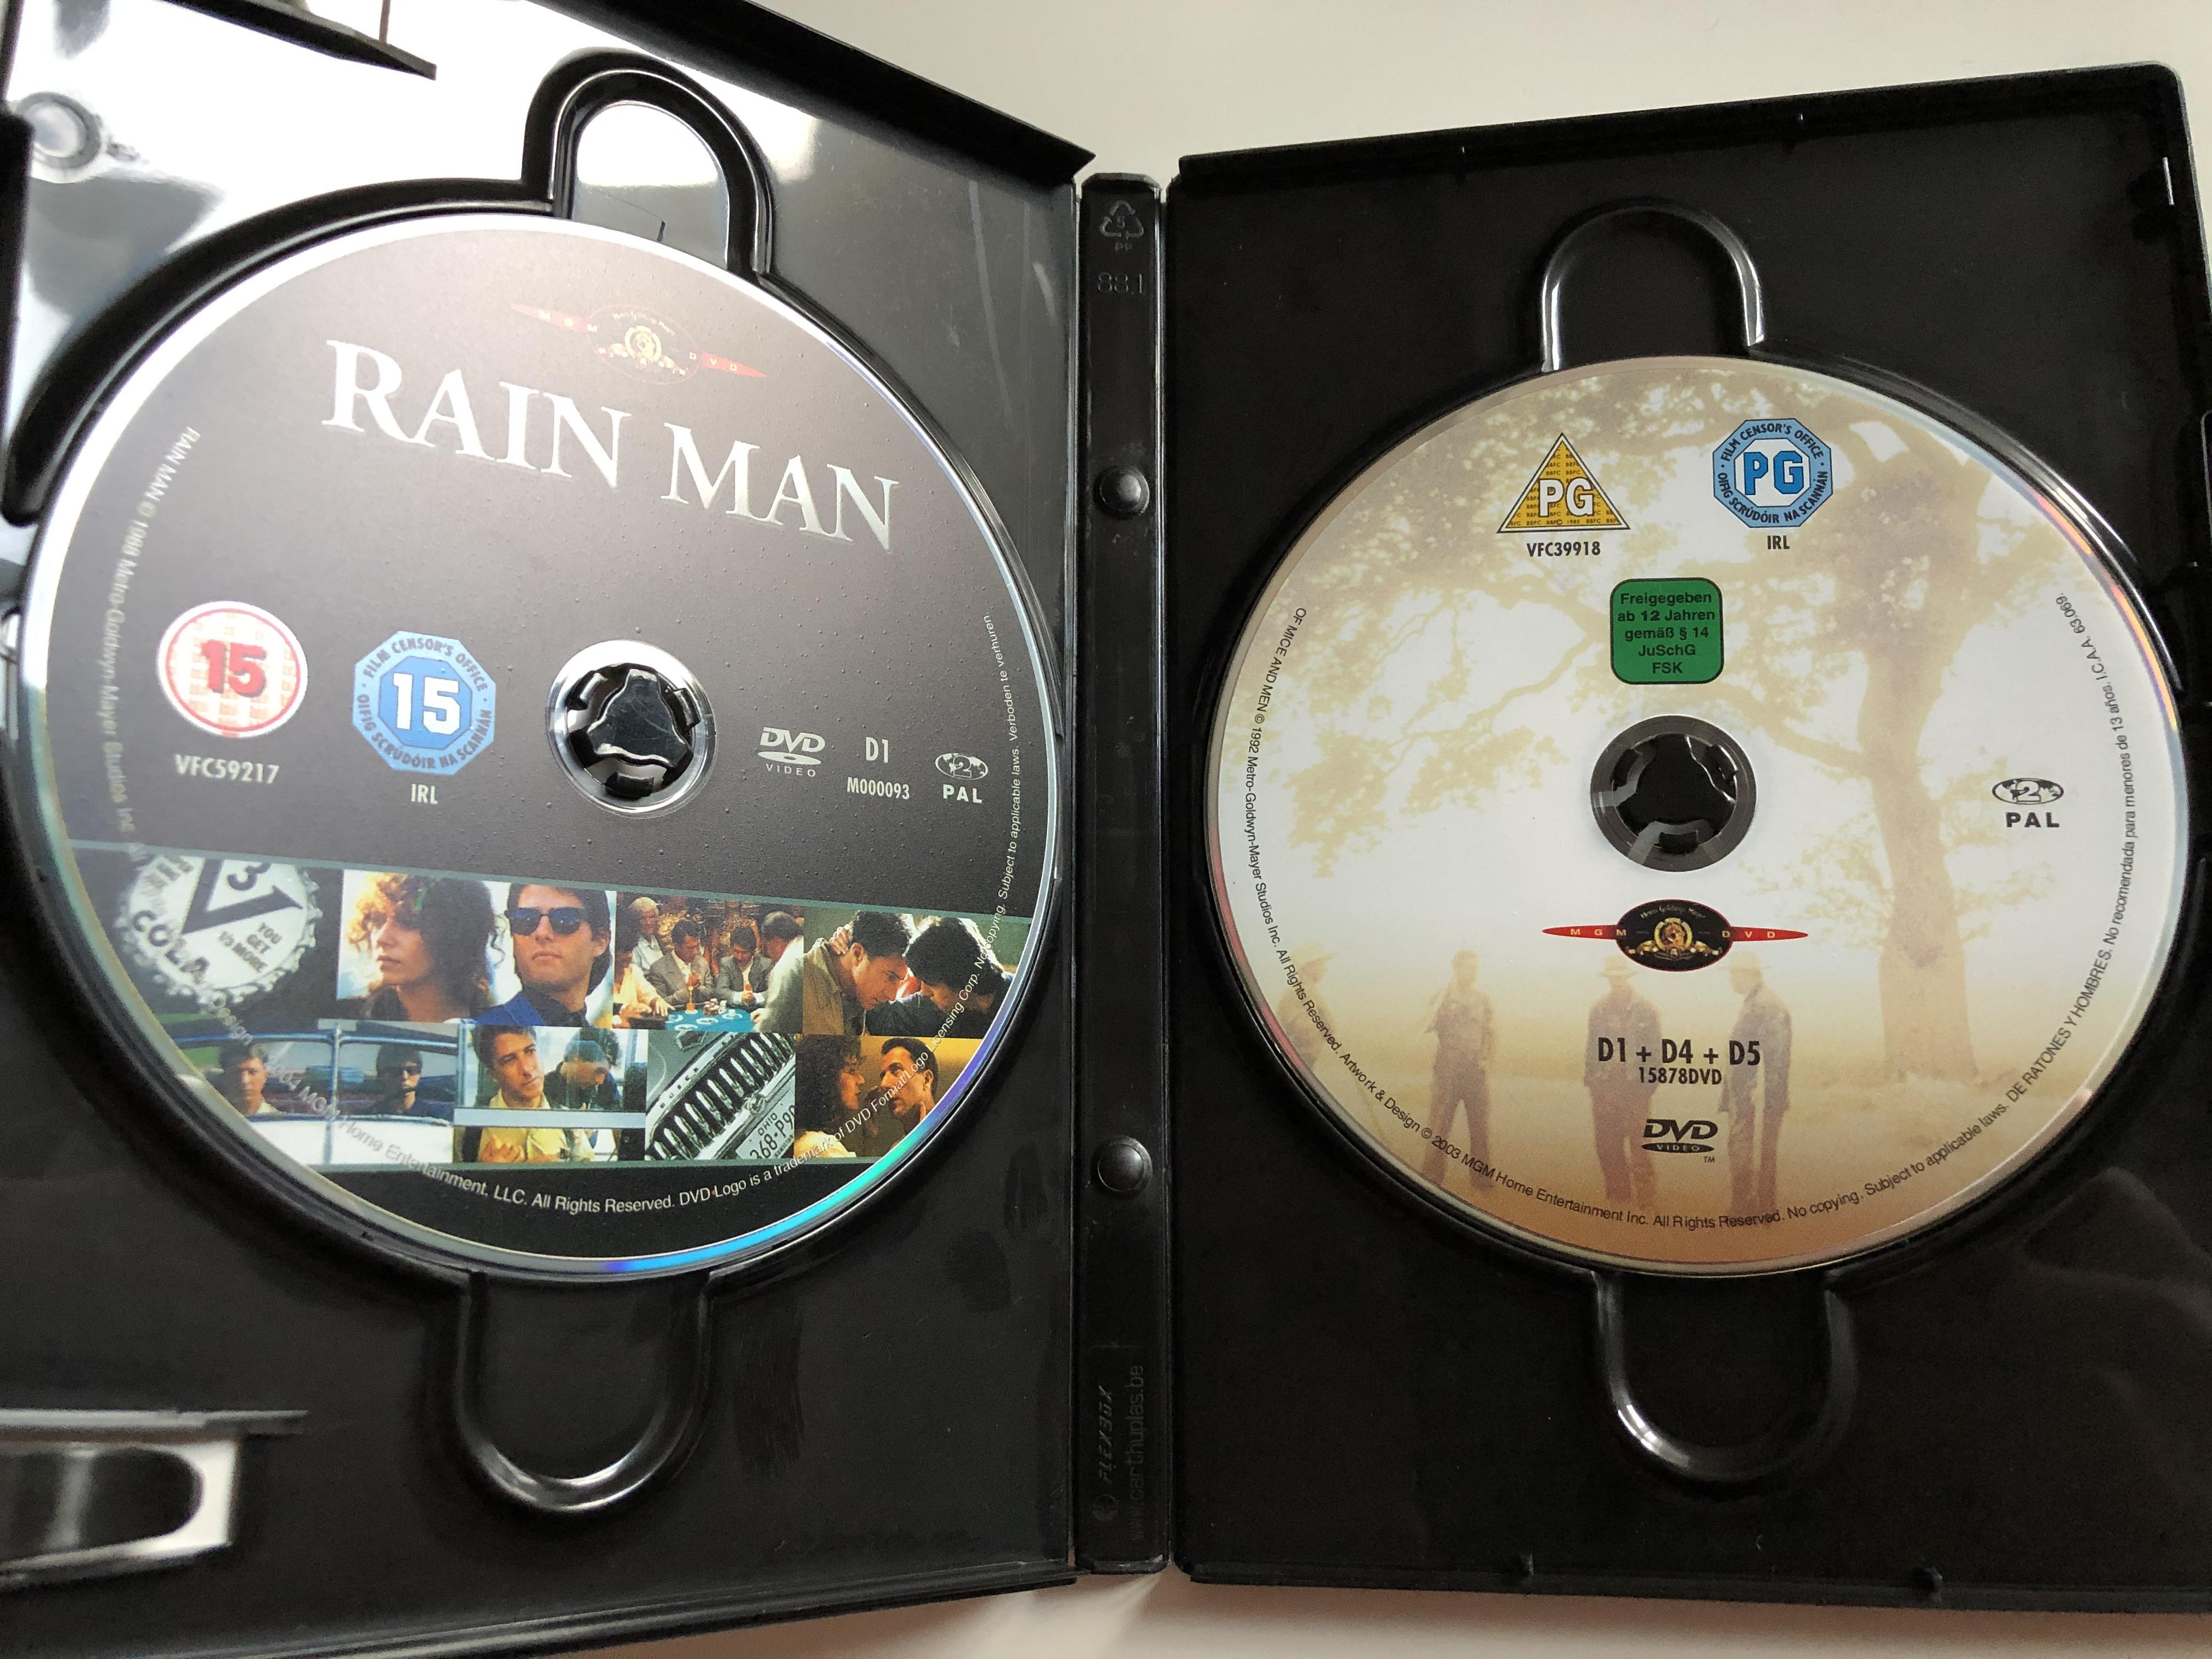 rain-man-dvd-1988-es-ember-2.jpg